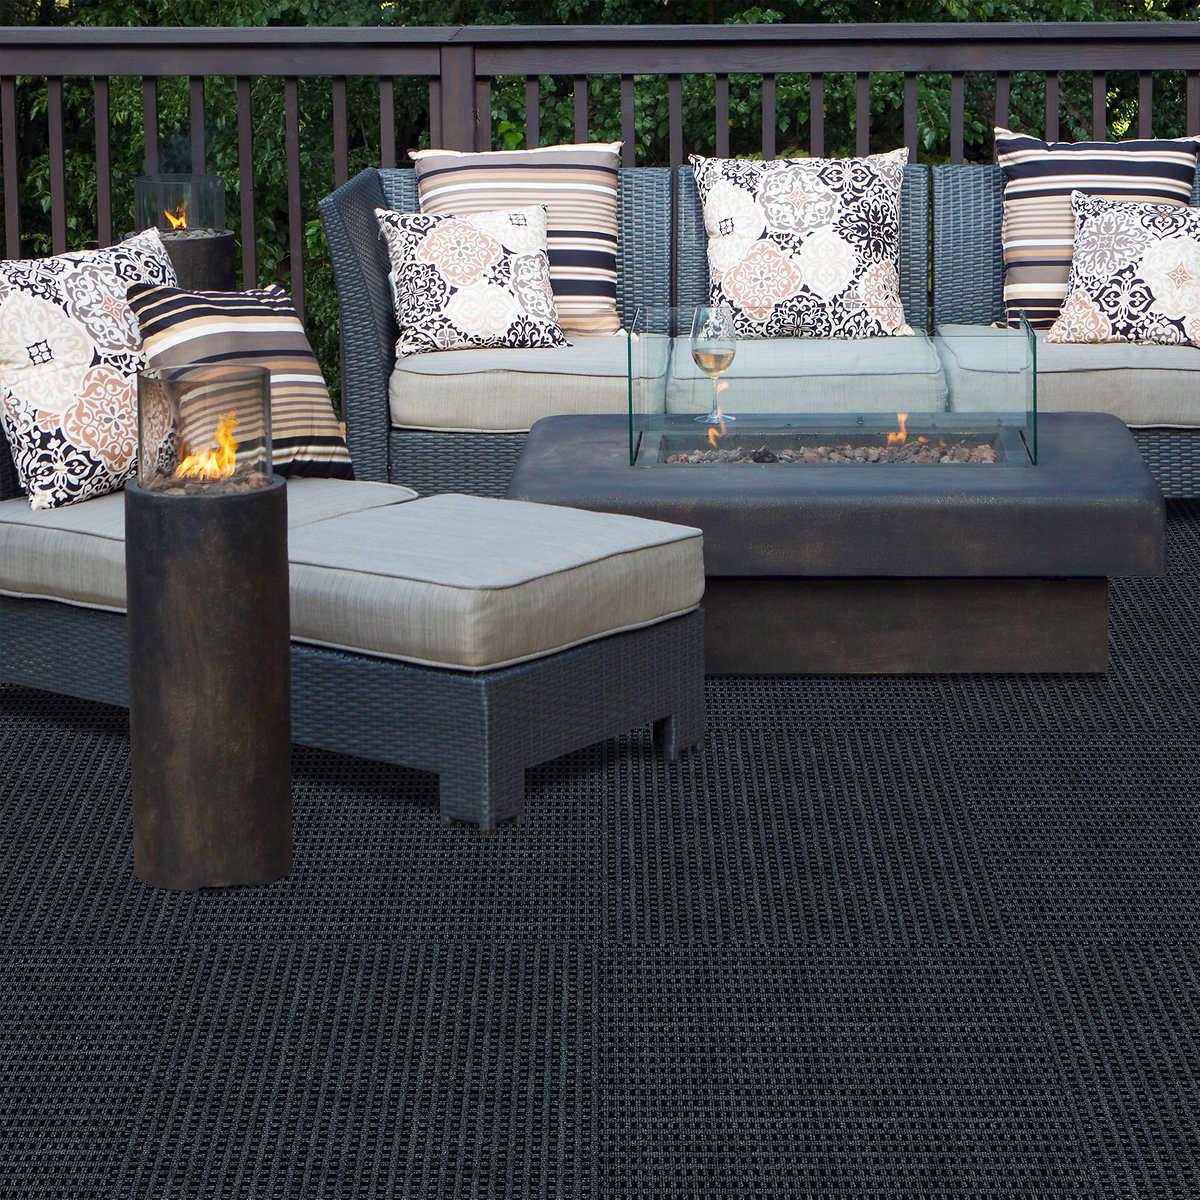 Mosaic multi purpose 24 x 24 adhesive carpet tiles indoor tiles indoor outdoor use 1 1 dailygadgetfo Images